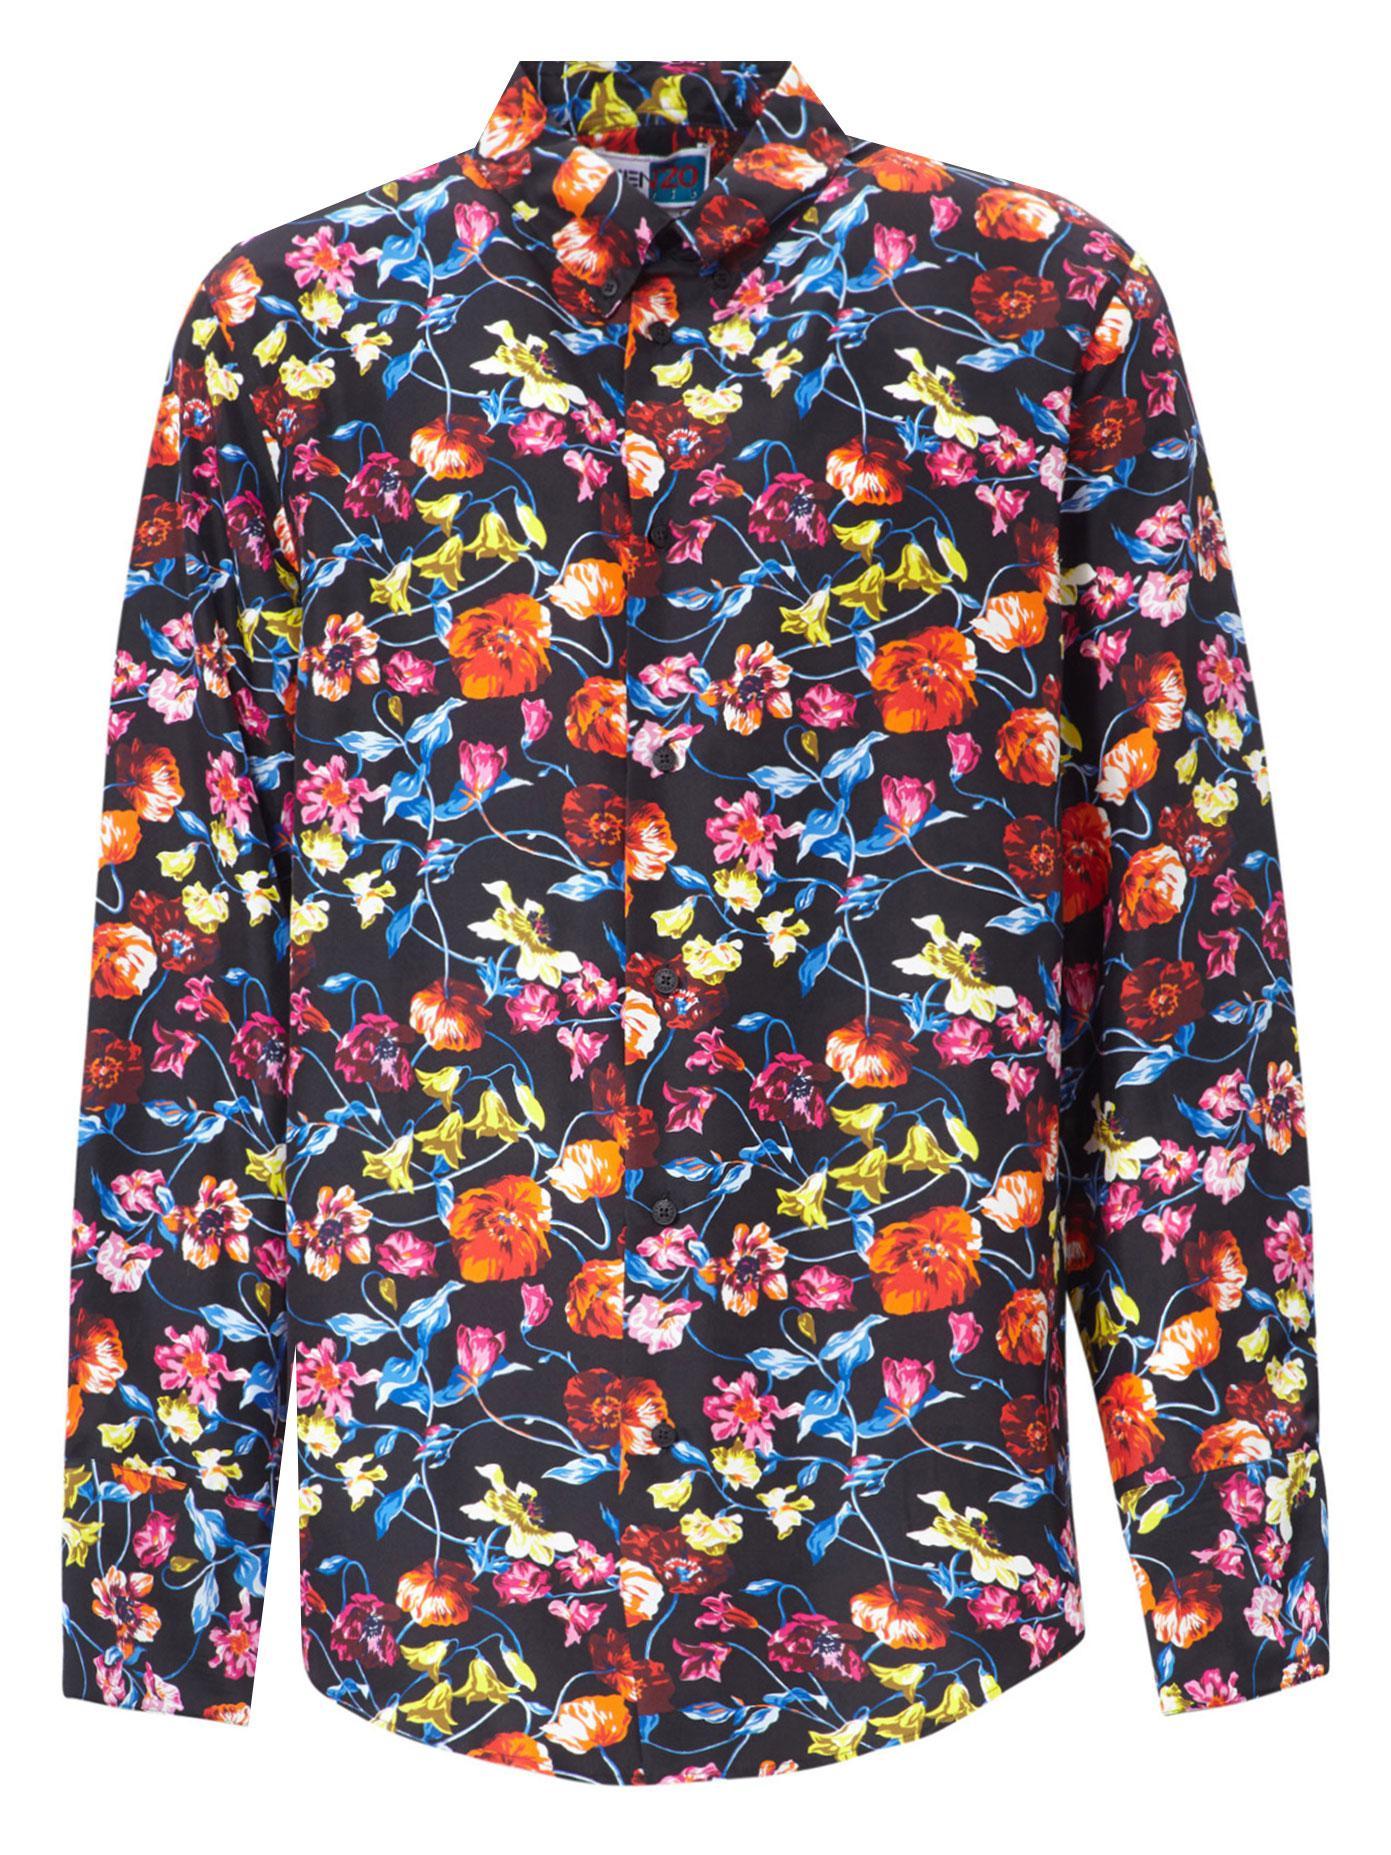 Lyst Kenzo Wild Flowers Silk Shirt In Blue For Men